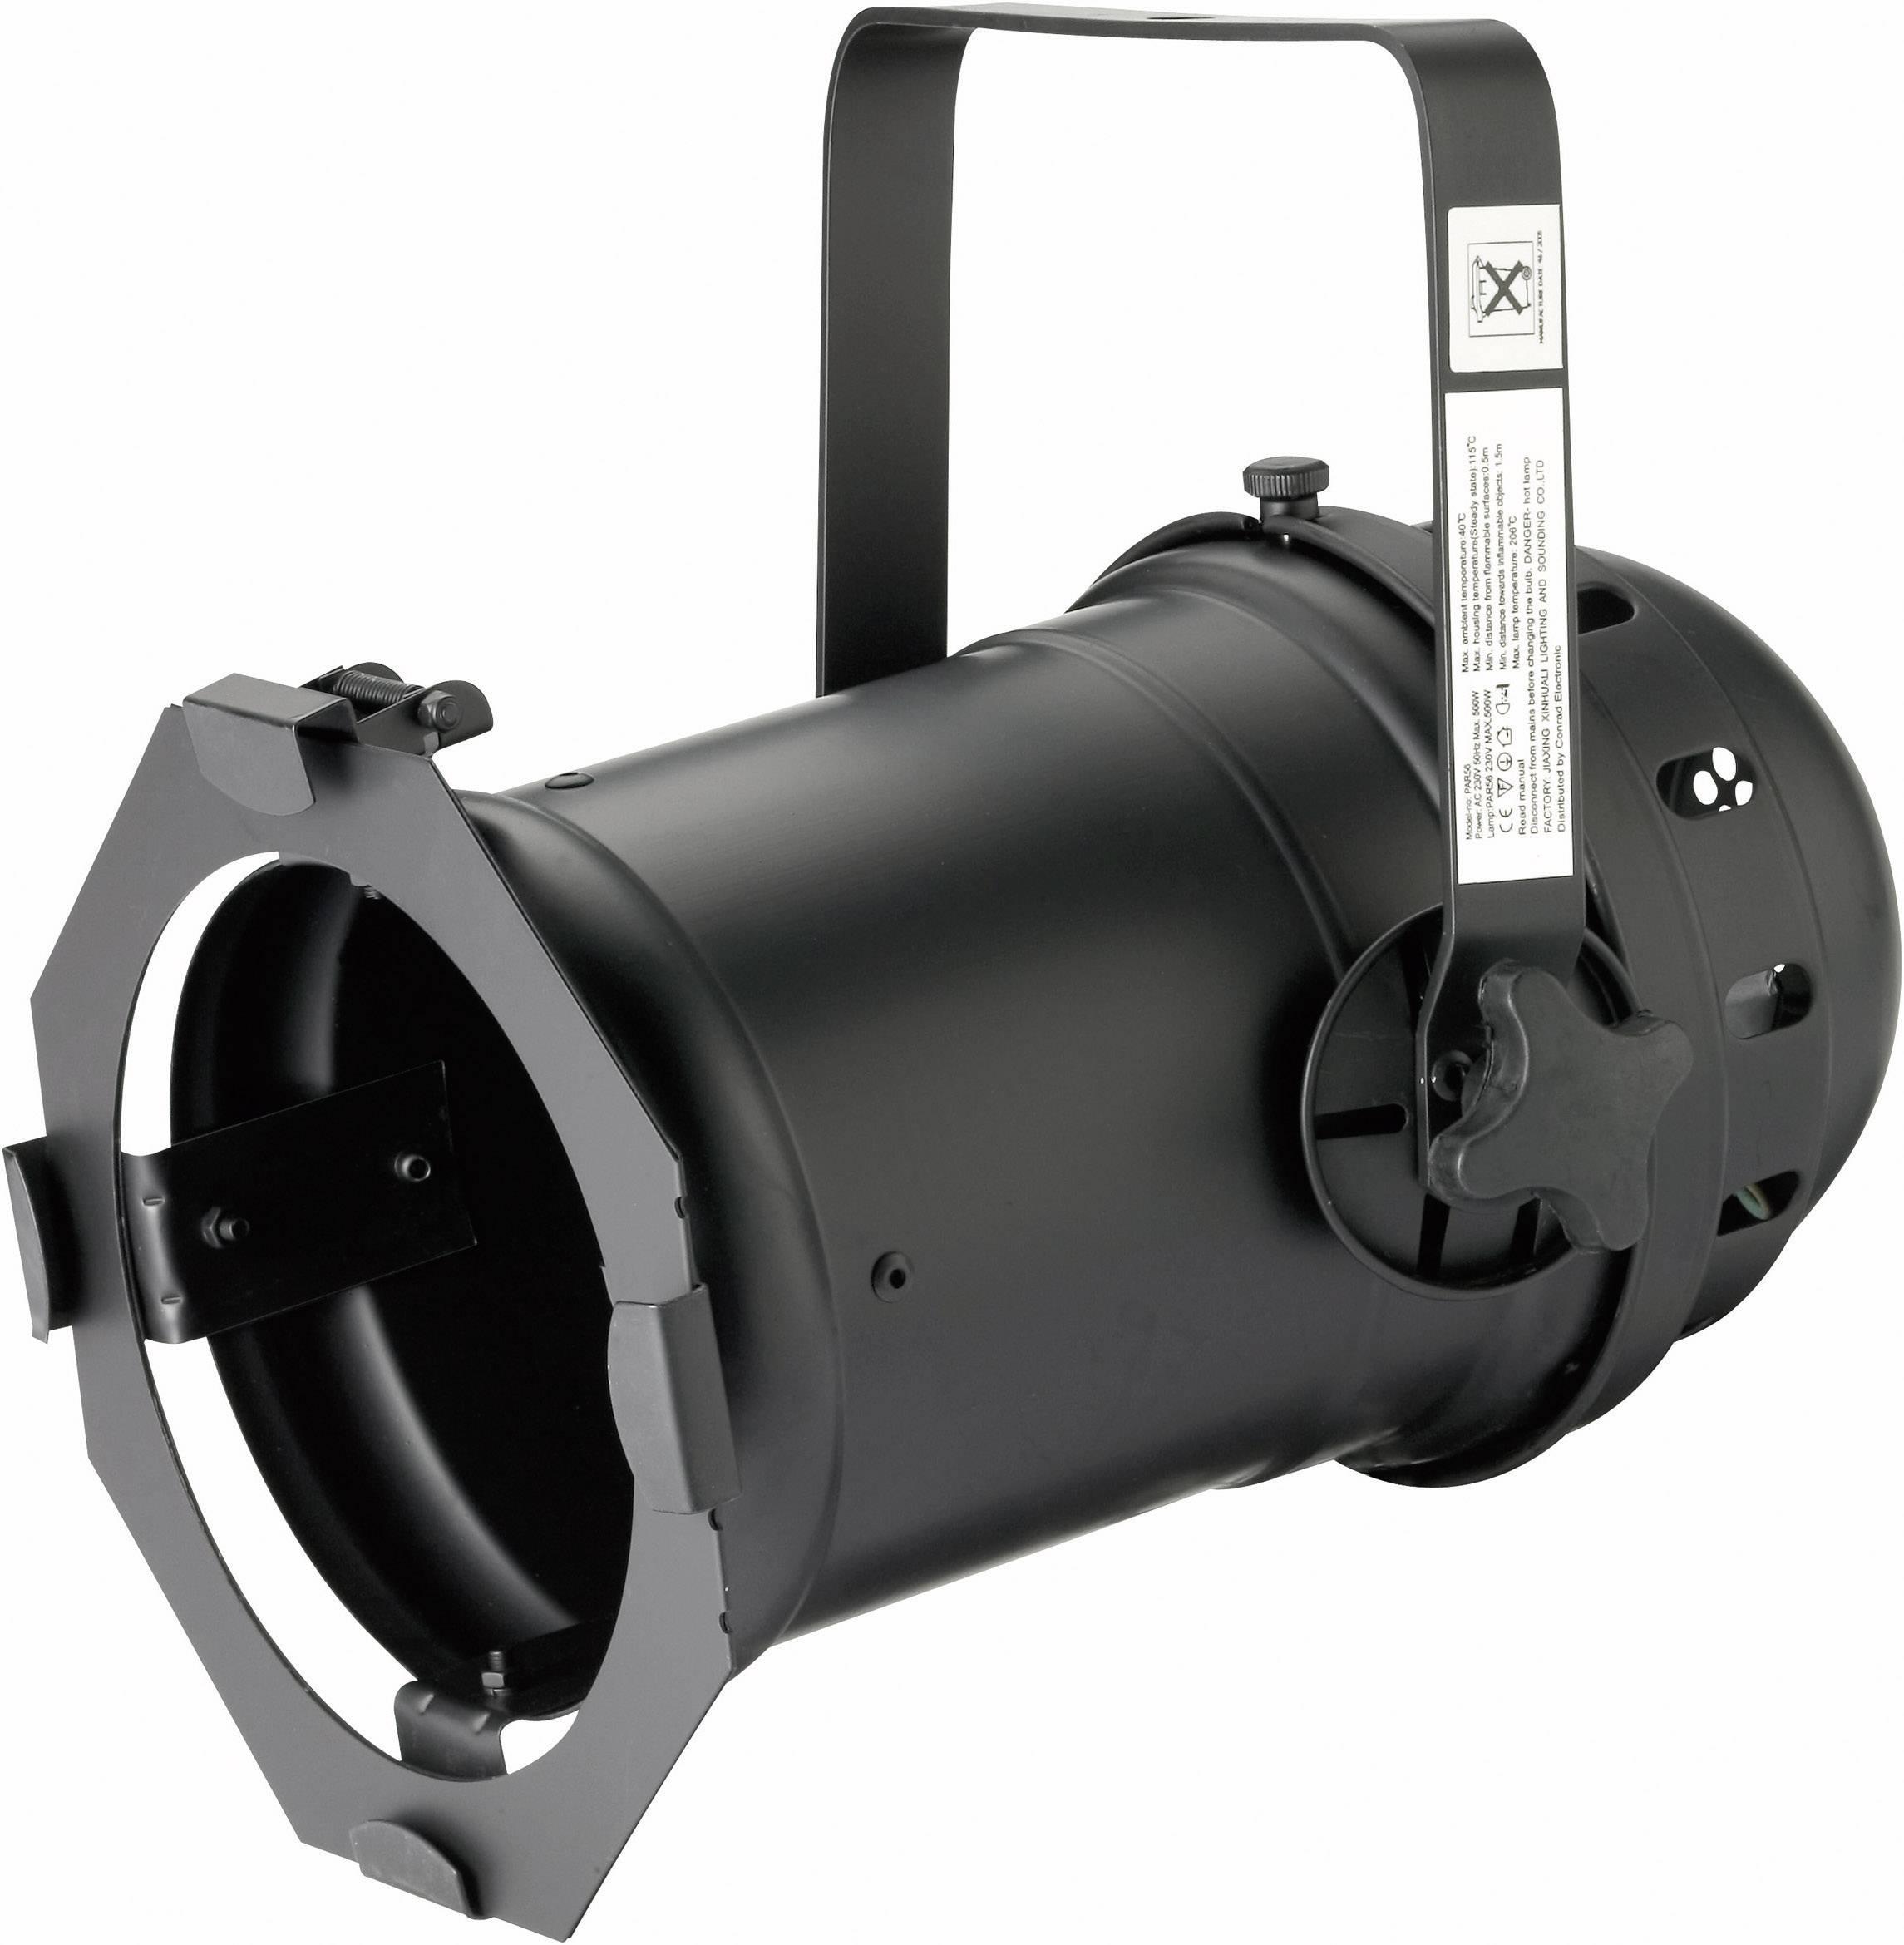 Reflektor Eurolite PAR 56 Long, 42000582, 300 W, bílá